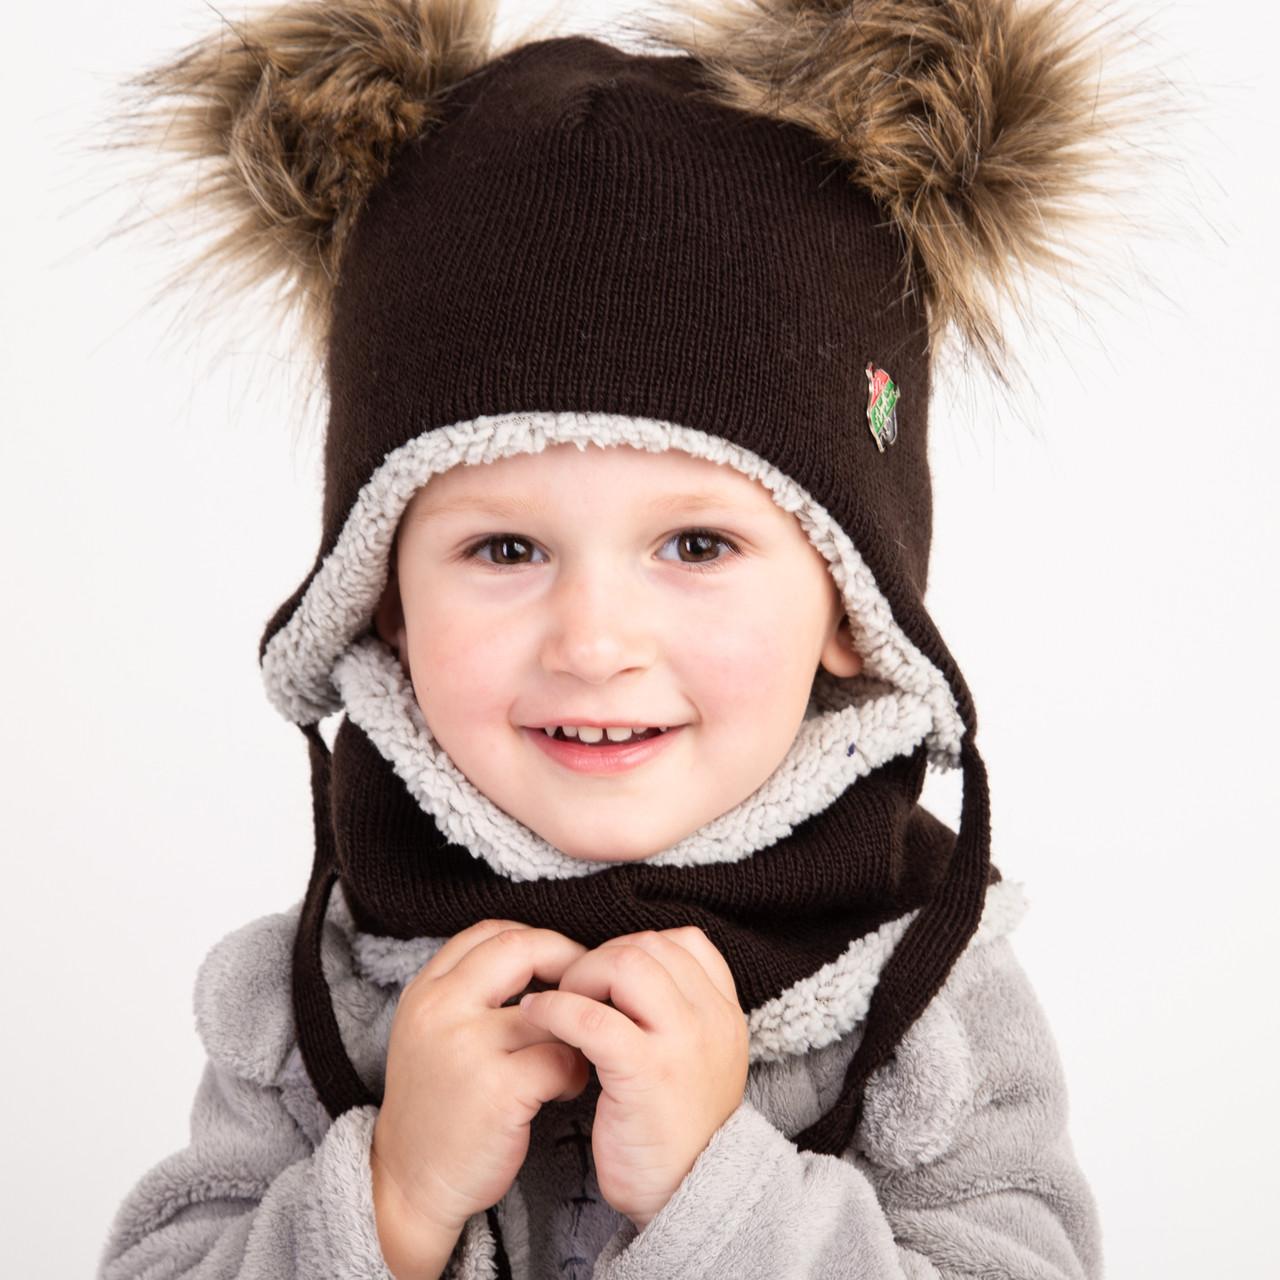 Зимний комплект с помпонами для мальчика - Артикул 2378